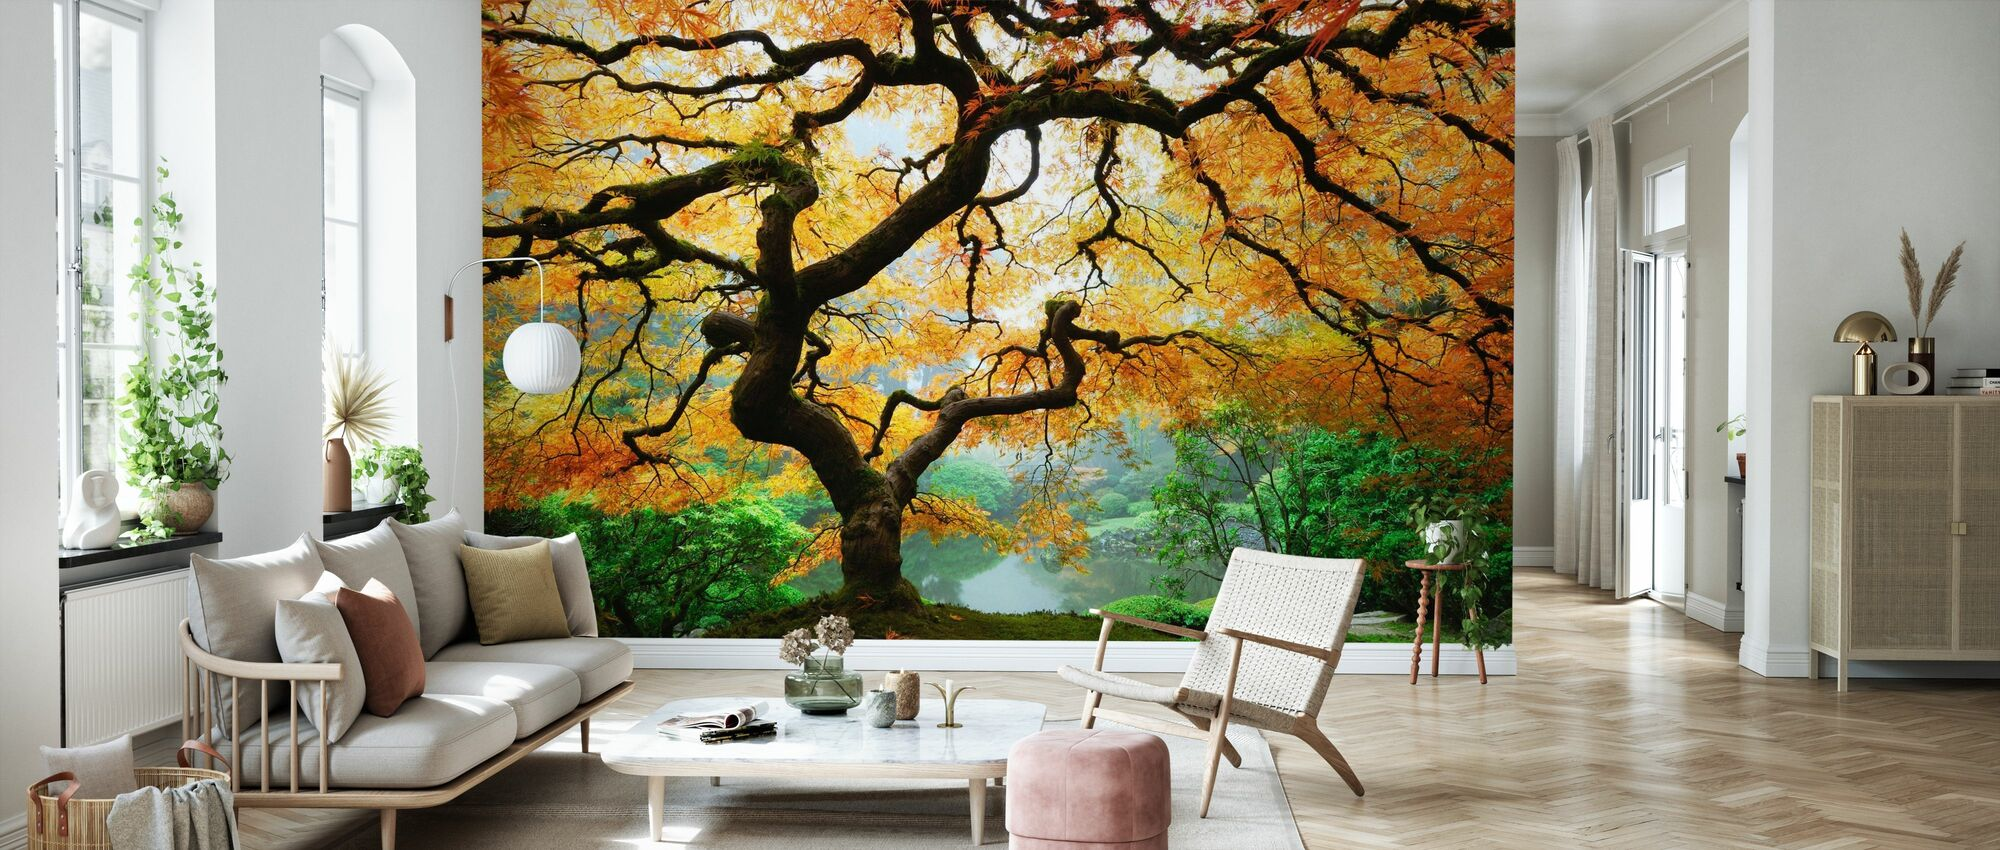 Herfst esdoorn - Behang - Woonkamer